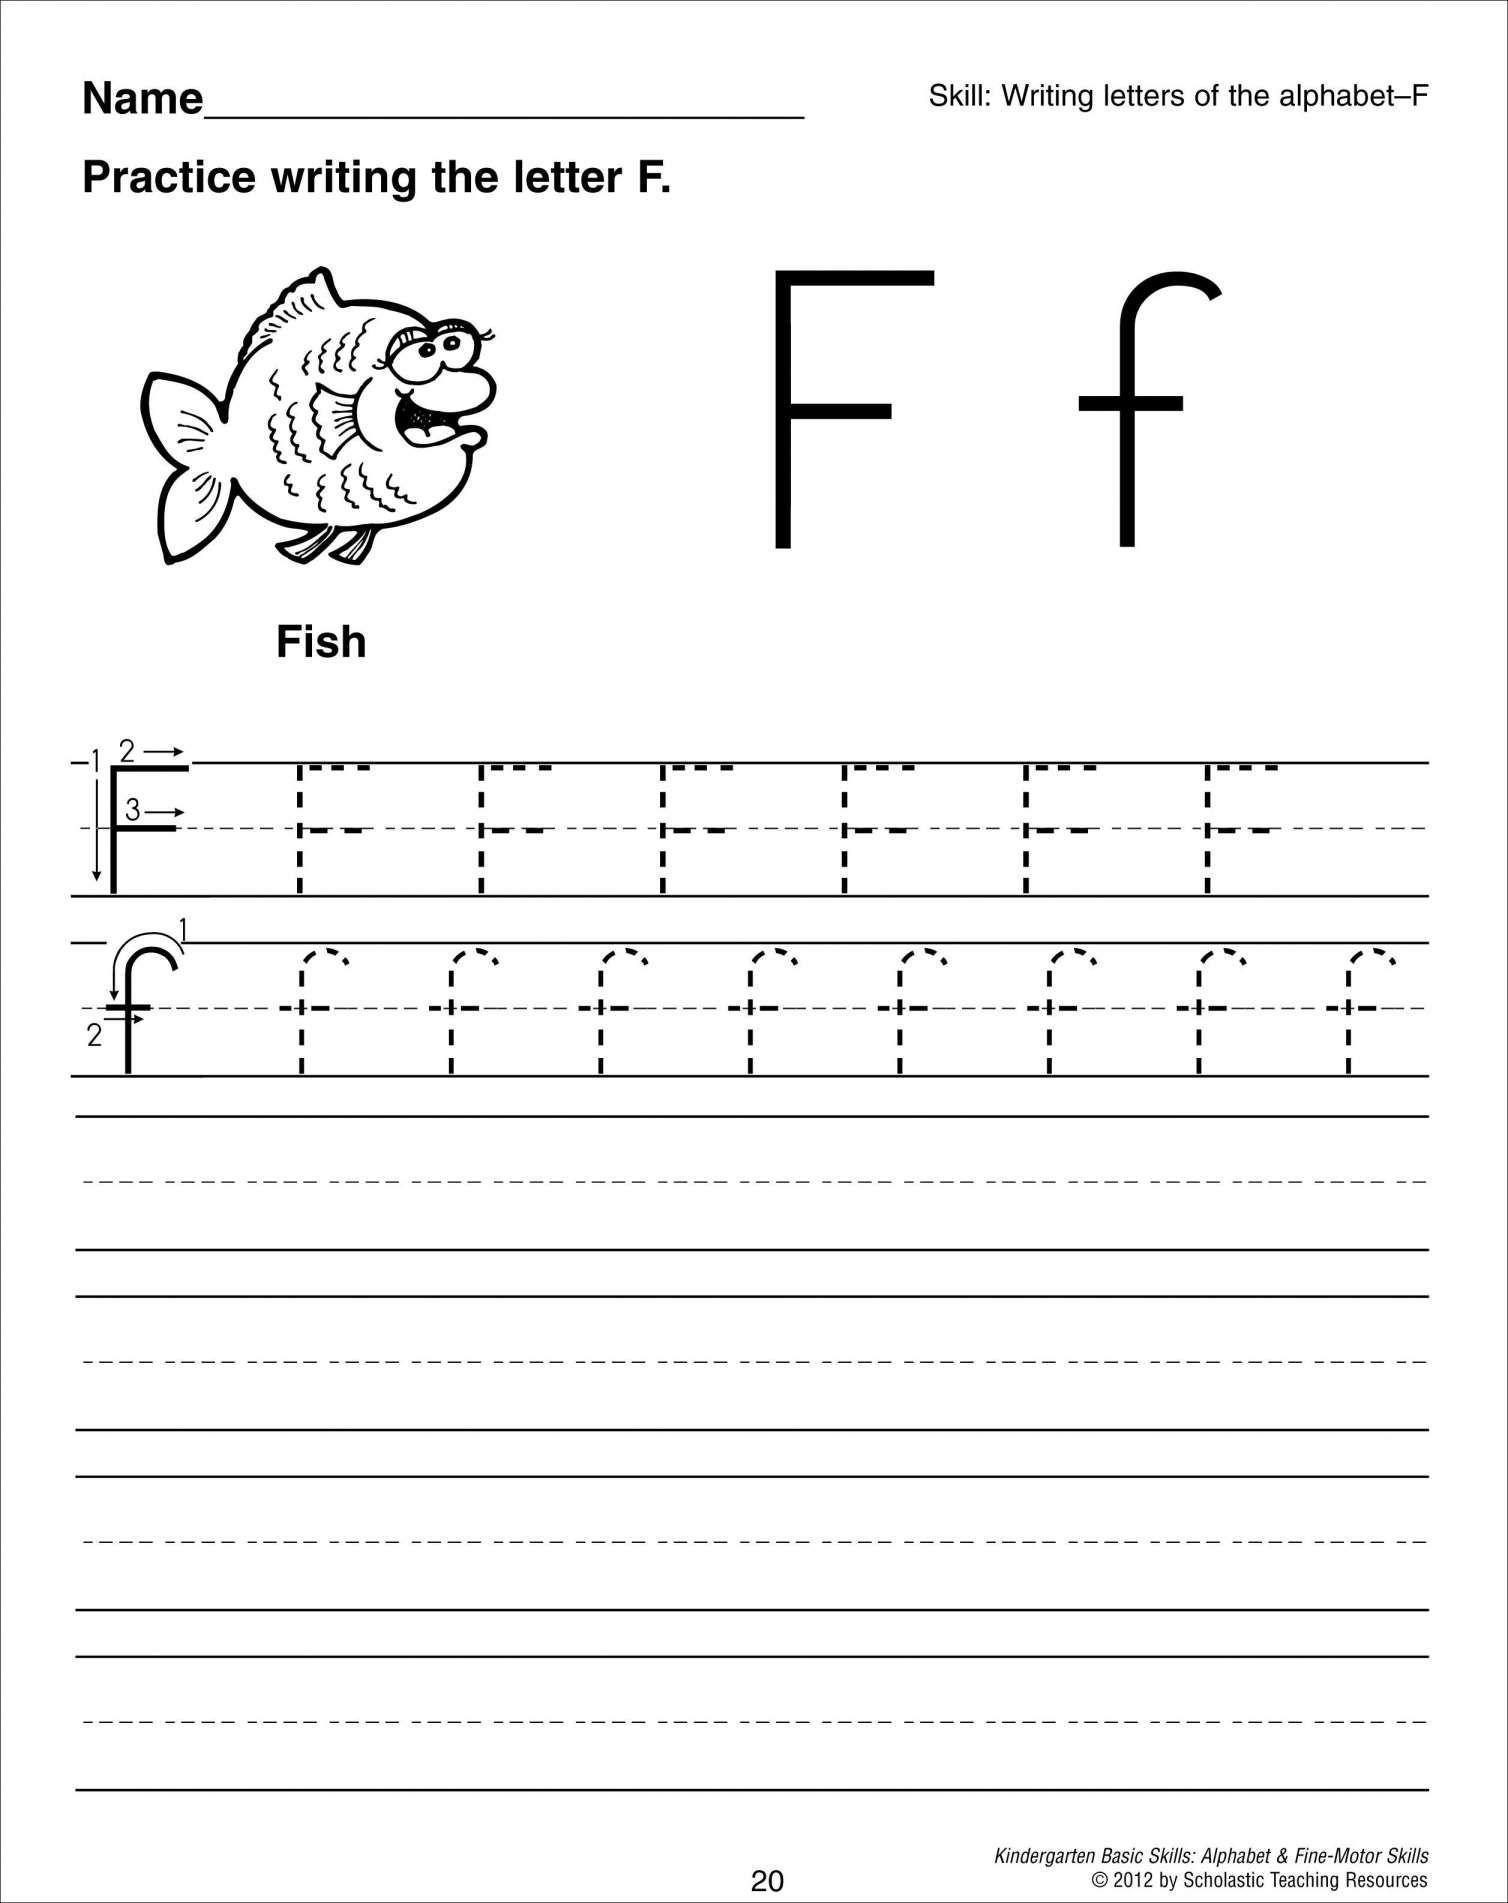 Preschool Worksheet Letter F And Letter F Tracing Worksheet with Letter F Tracing Sheet